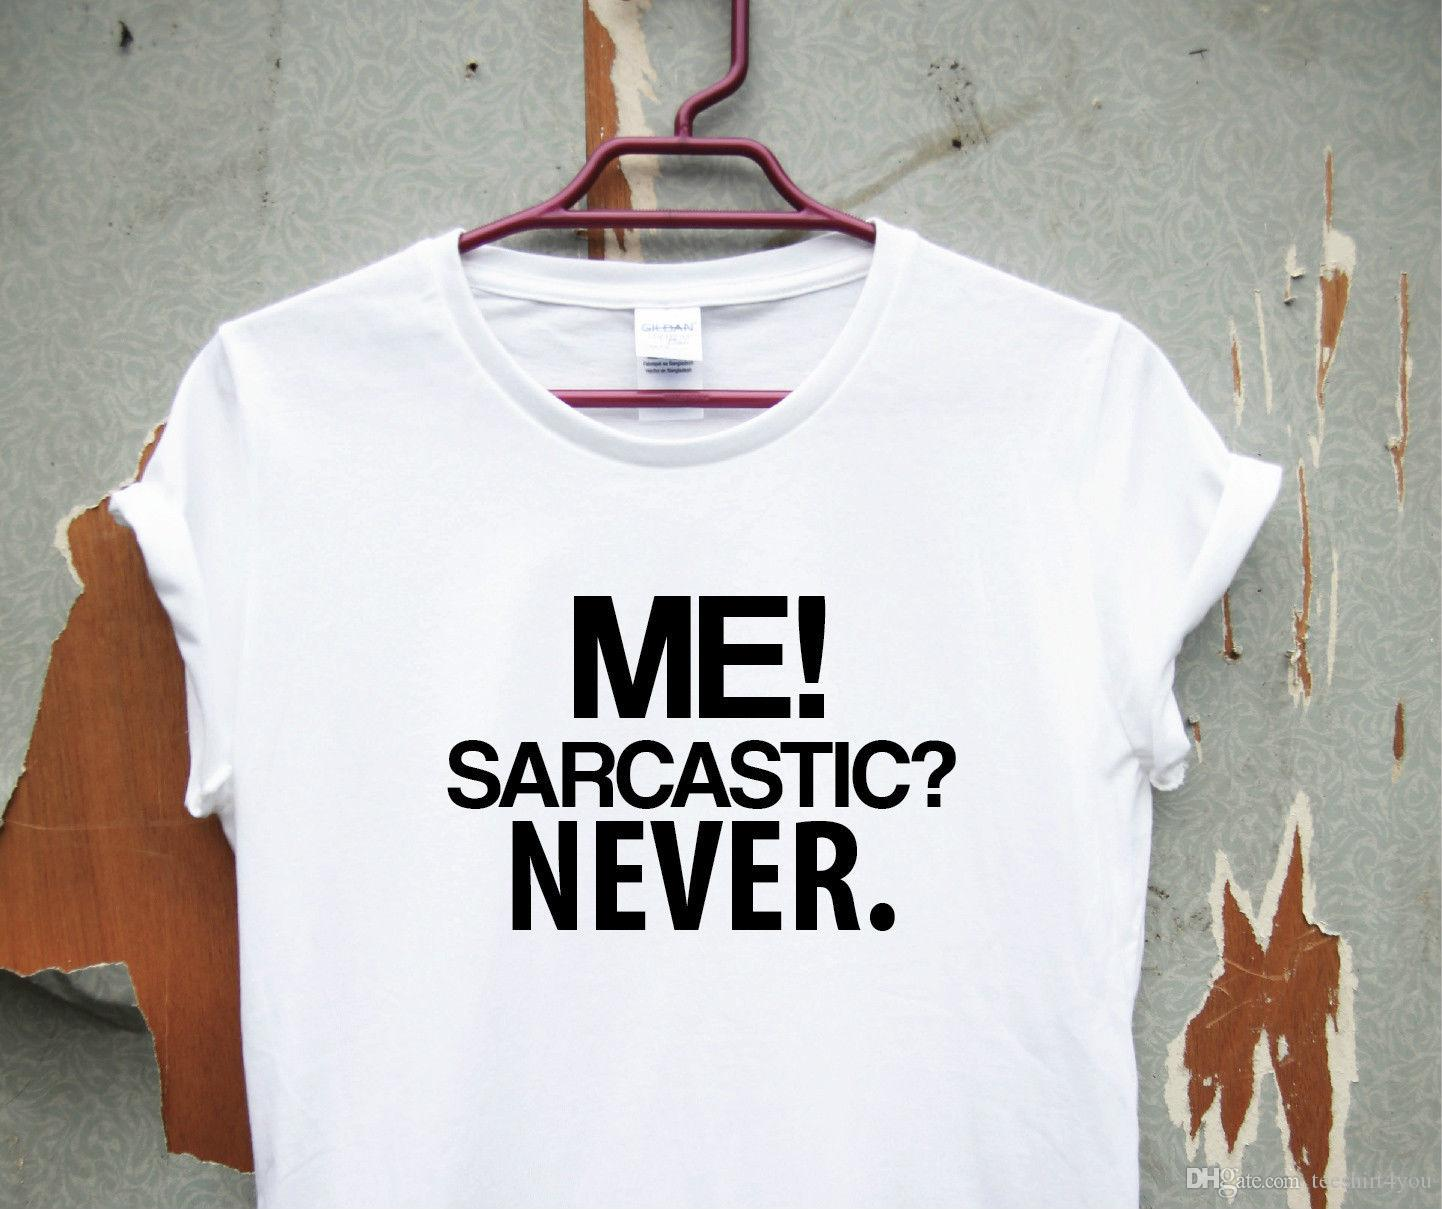 160595b2f4e87 Me Sarcastic? - Funny Saying T-Shirt Mens Womens Quote Sarcasm Ladies  Slogan Top Tee Shirt Men's Printing Custom Short Sleeve Boyfriend's Bi